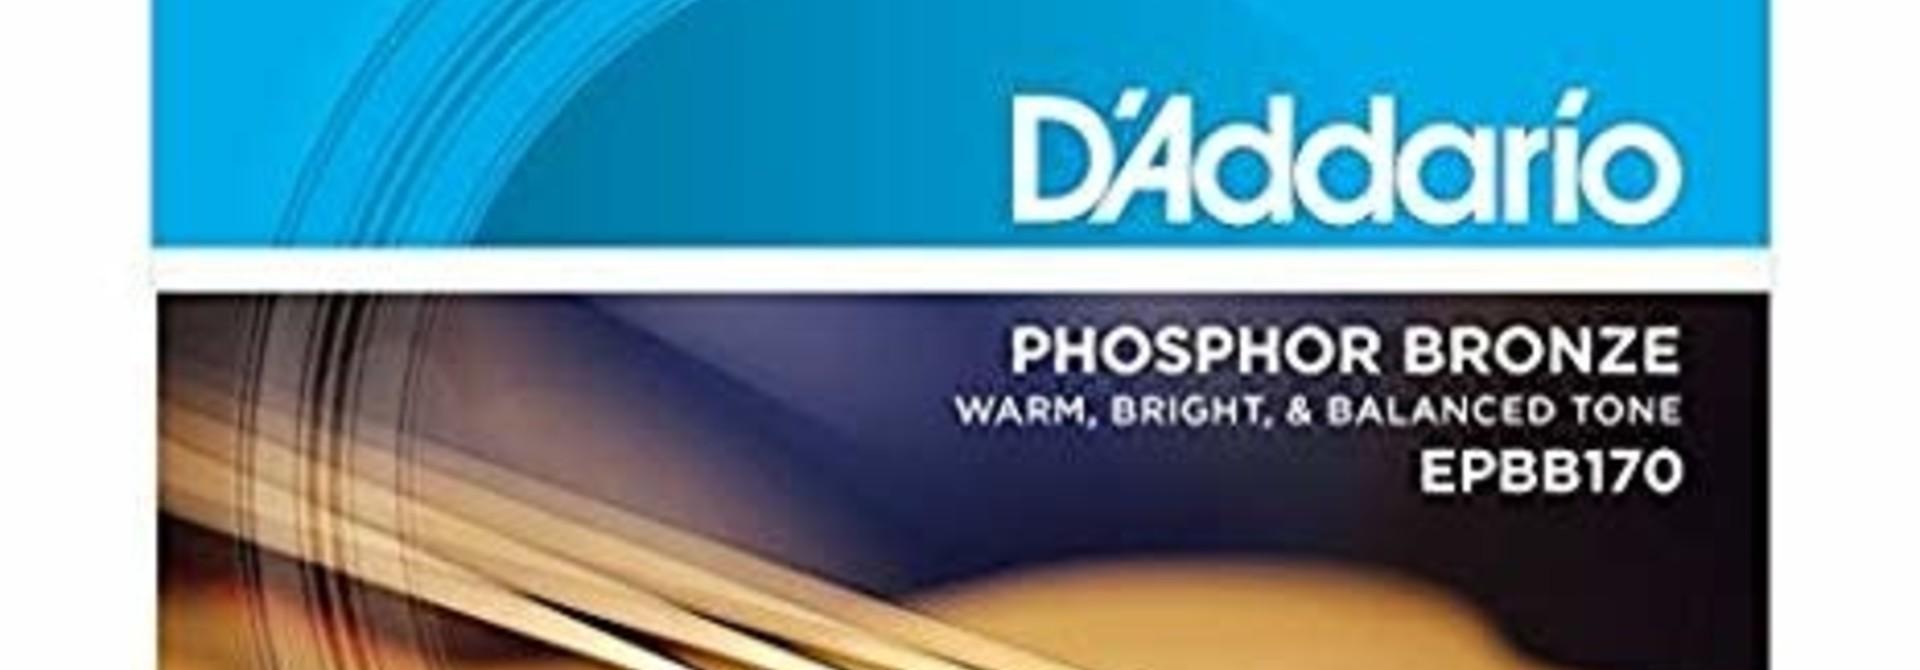 D'addario EPBB170 Phos/Bron Acoustic Bass Strings